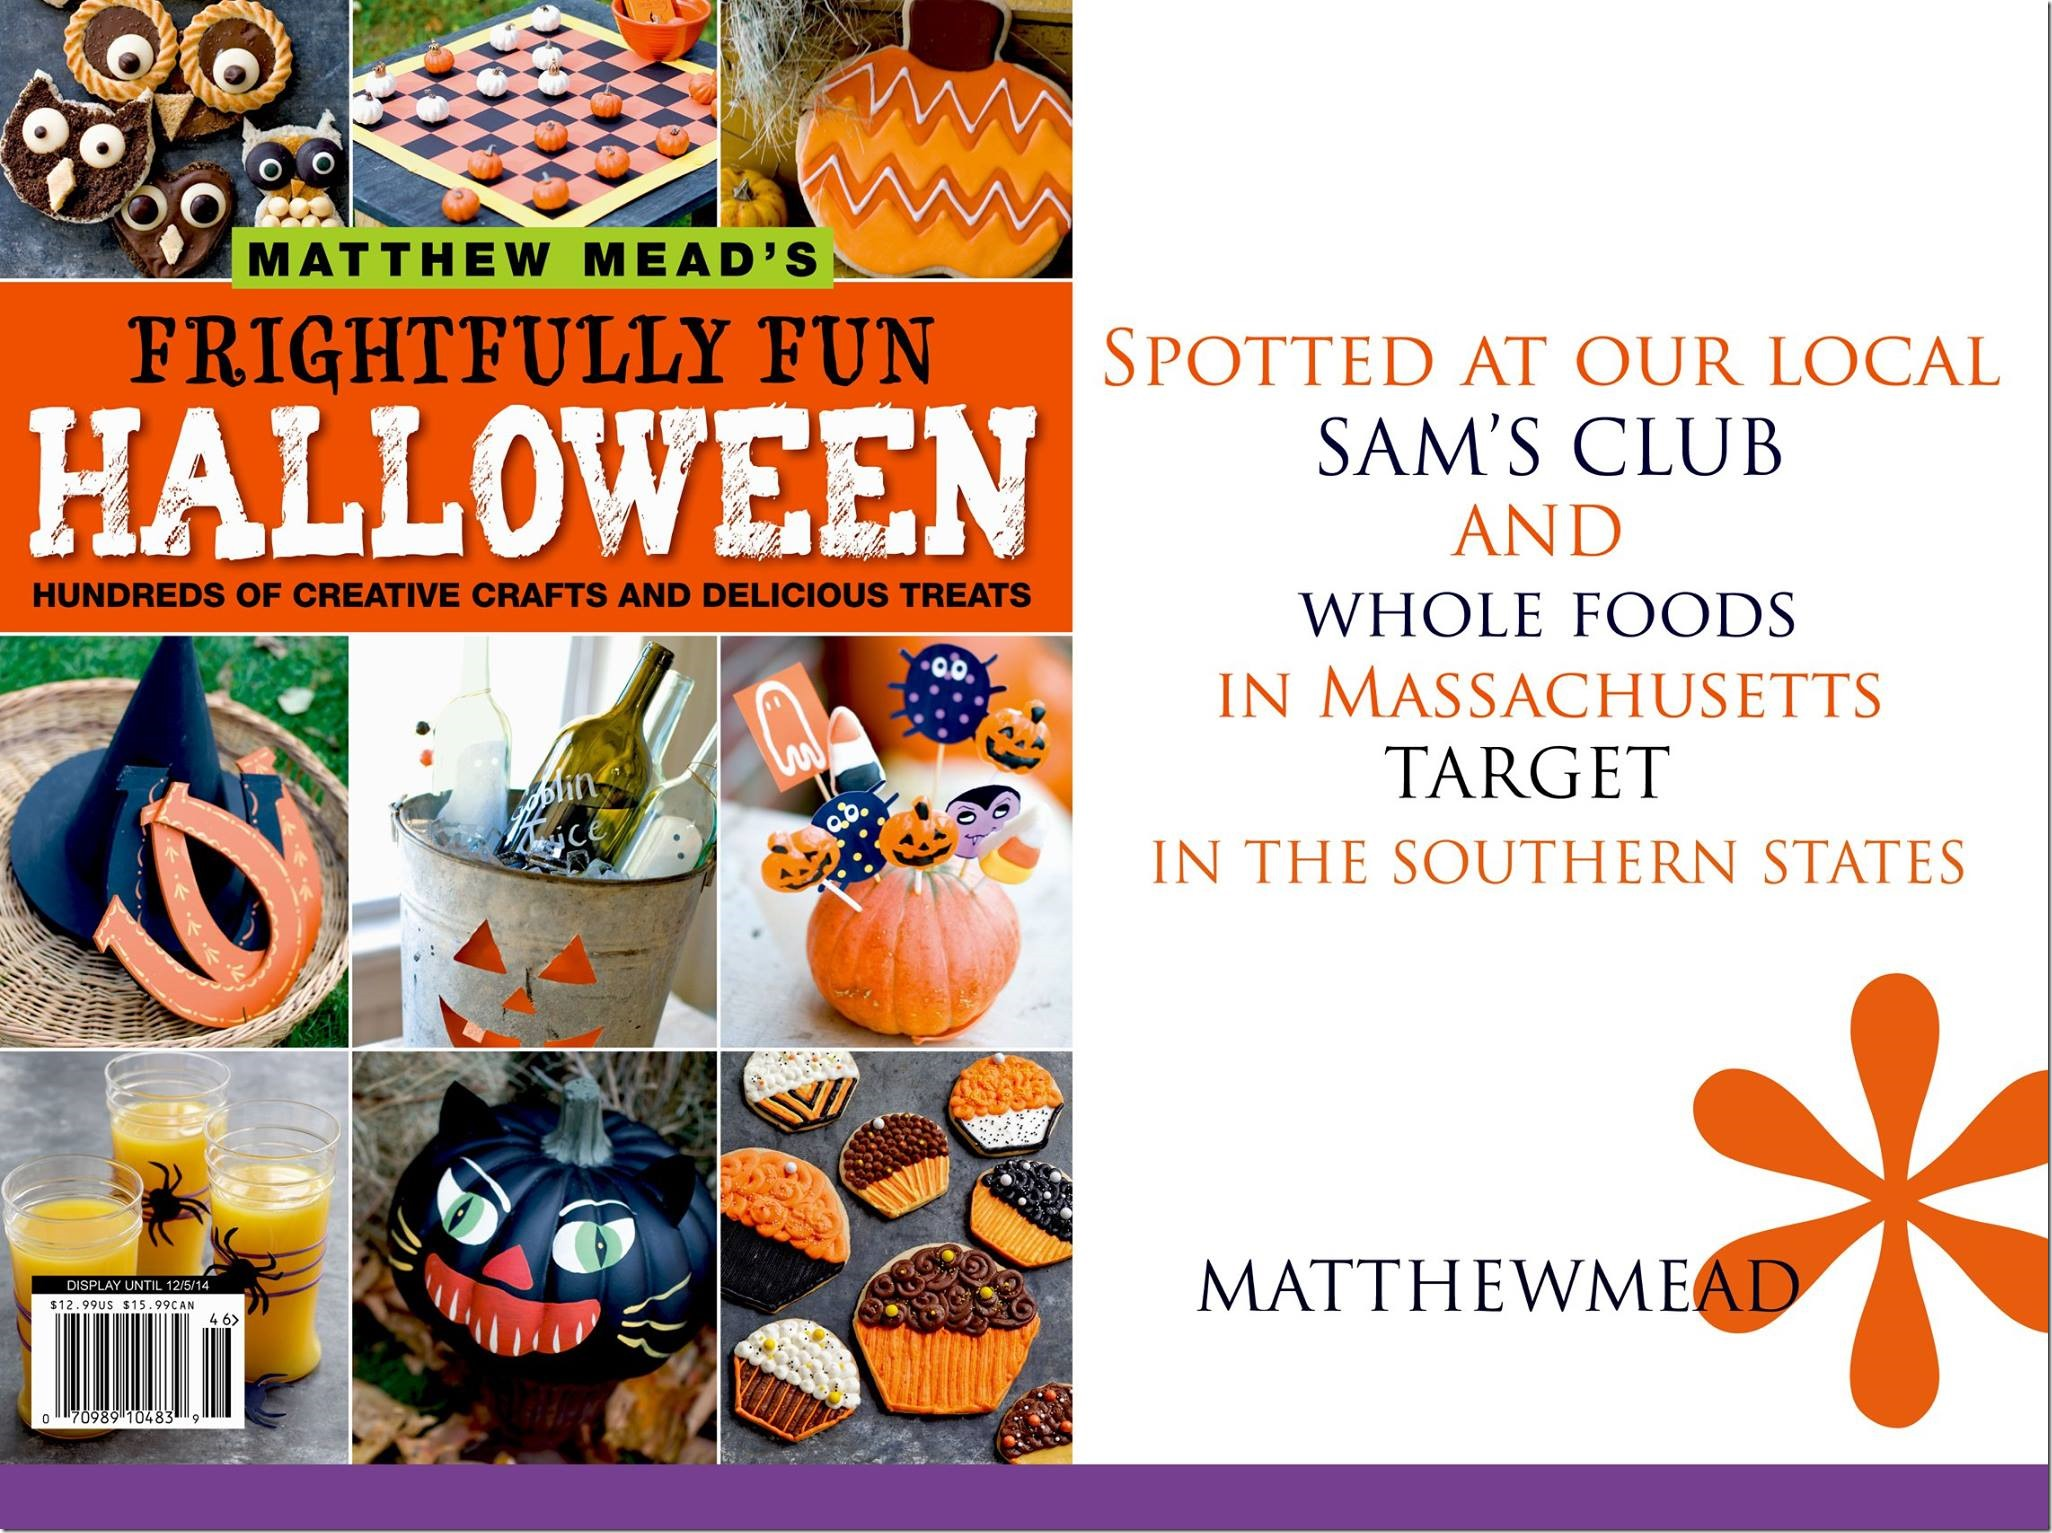 Frightfully Fun Halloween